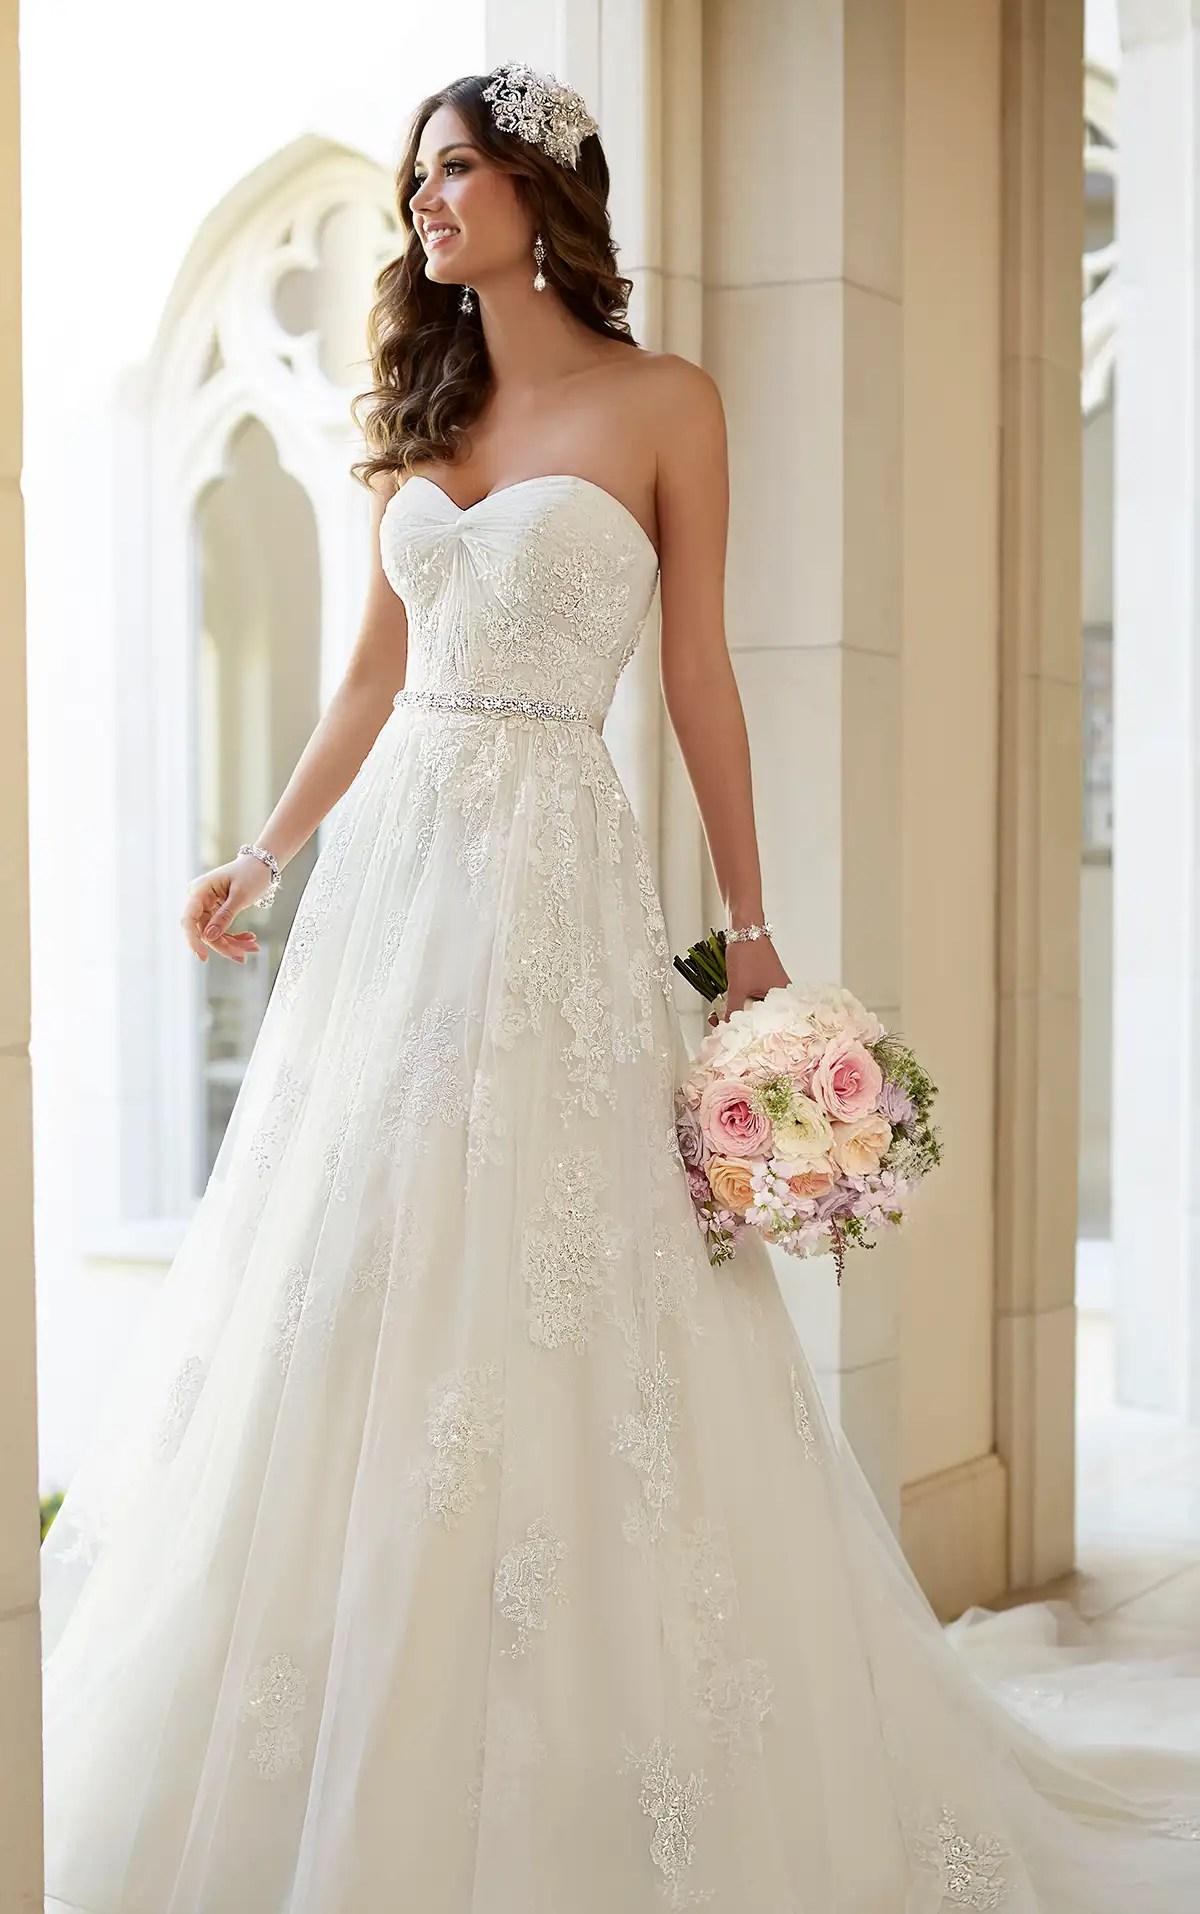 Flowing Tulle ALine Wedding Dress  Stella York Wedding Dresses